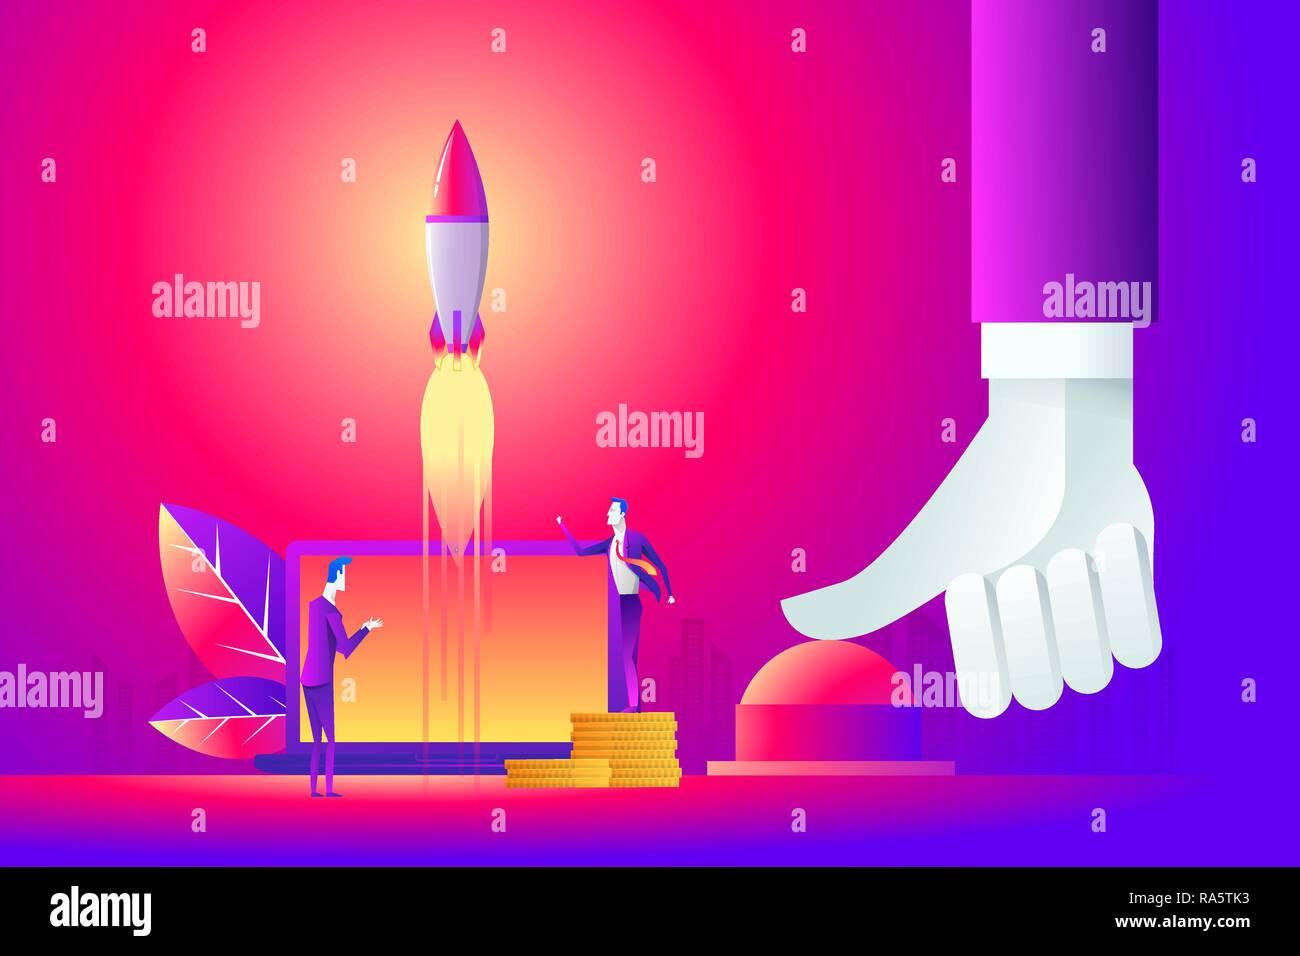 Business concept illustration of a businessman hand pushing start button, start up, war concept. - Stock Image